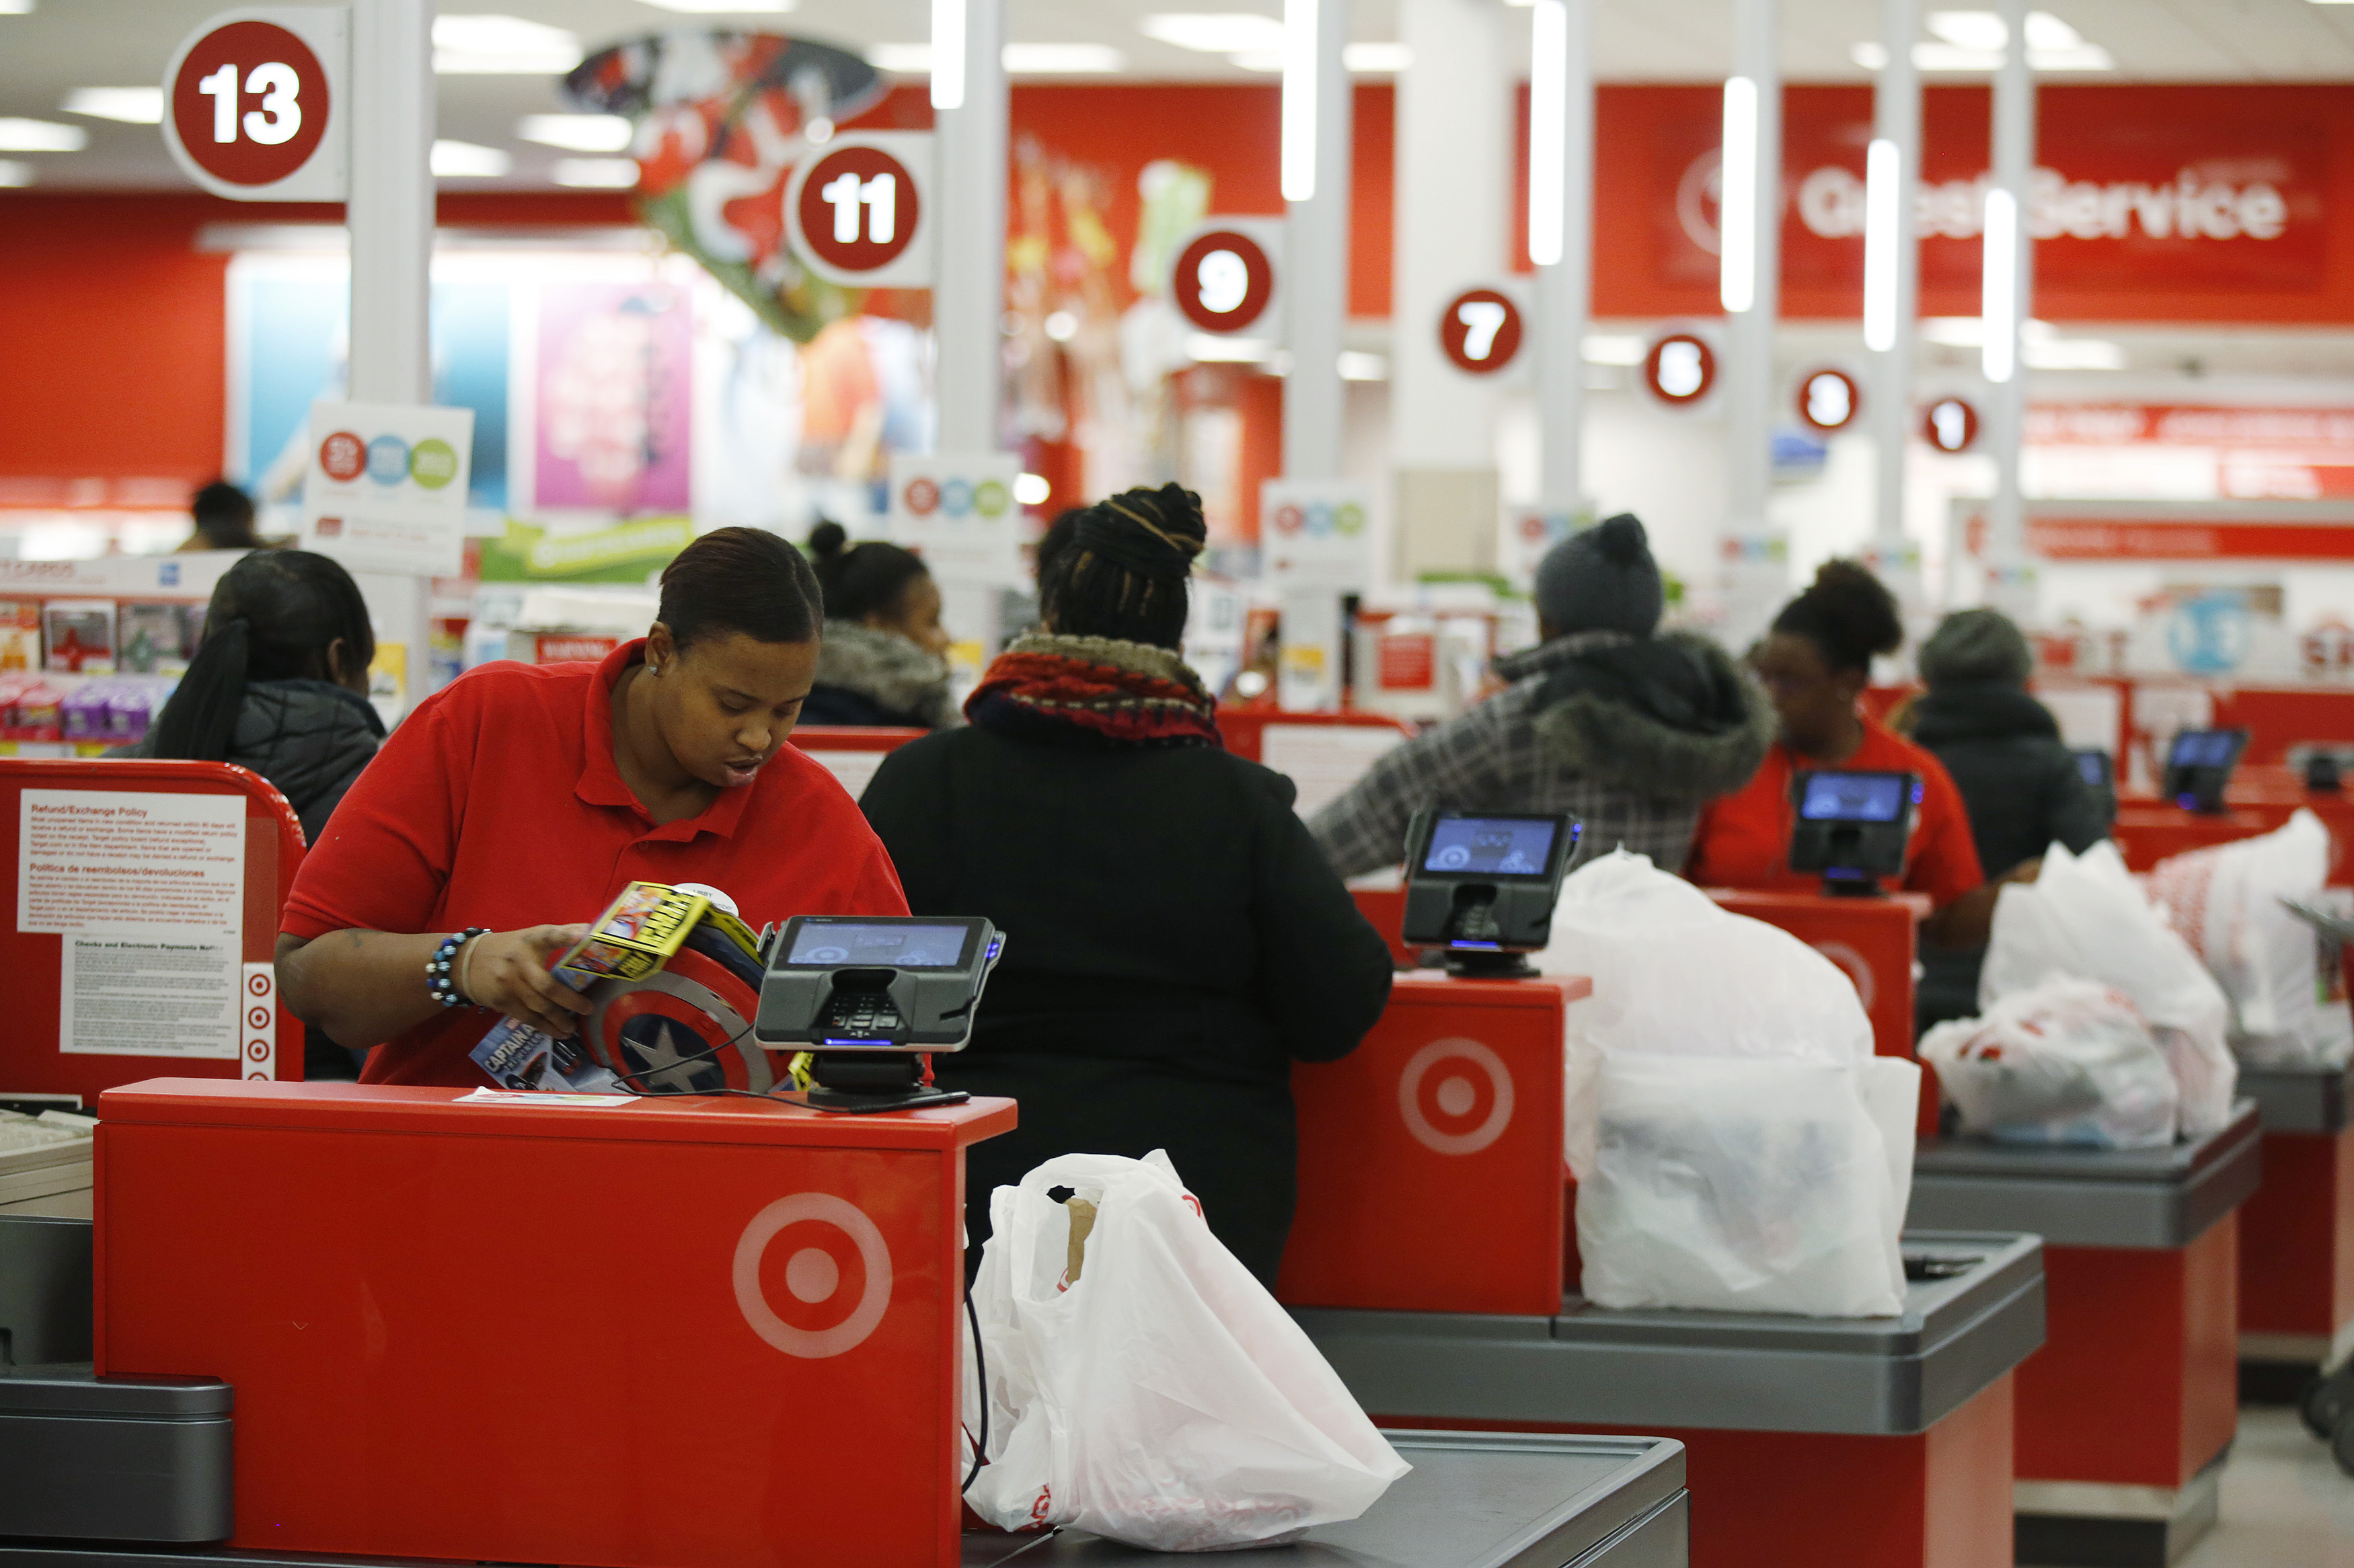 CUE Target cashier001.'